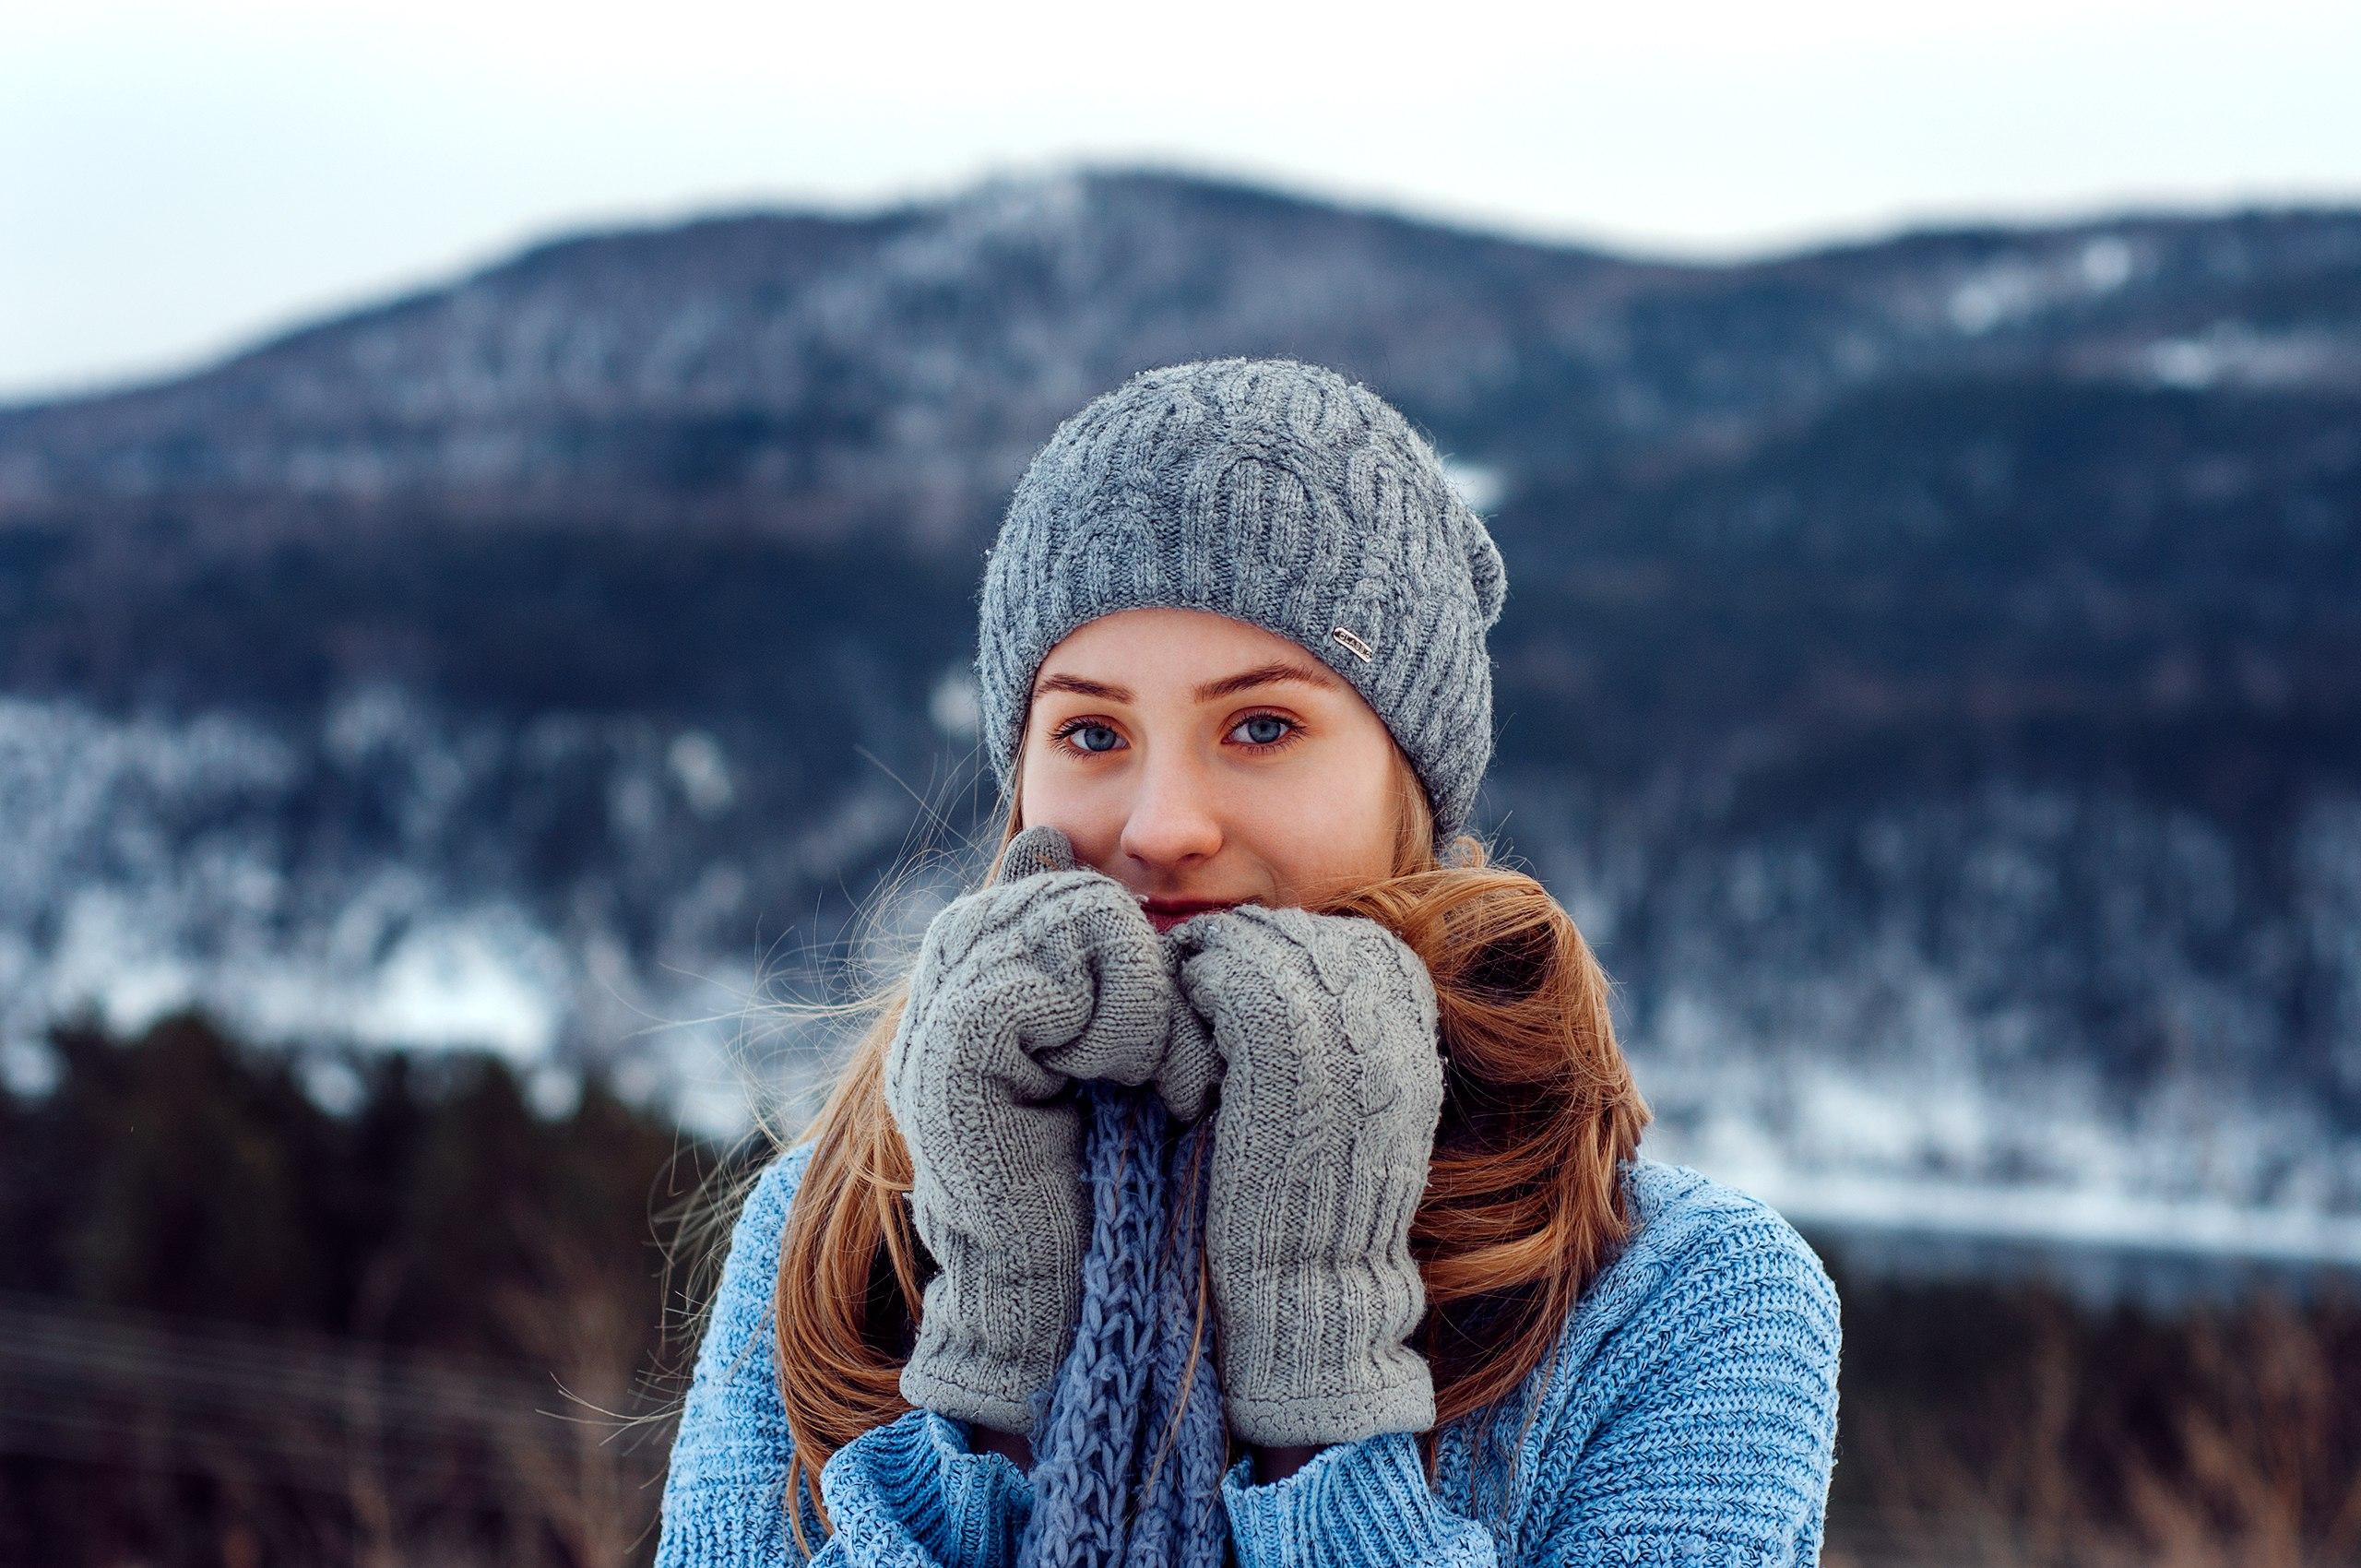 f53b3e94cf248 mujer modelo rubia suéter Mirando al espectador gorro de lana guantes  bufanda montañas nieve Mujeres al